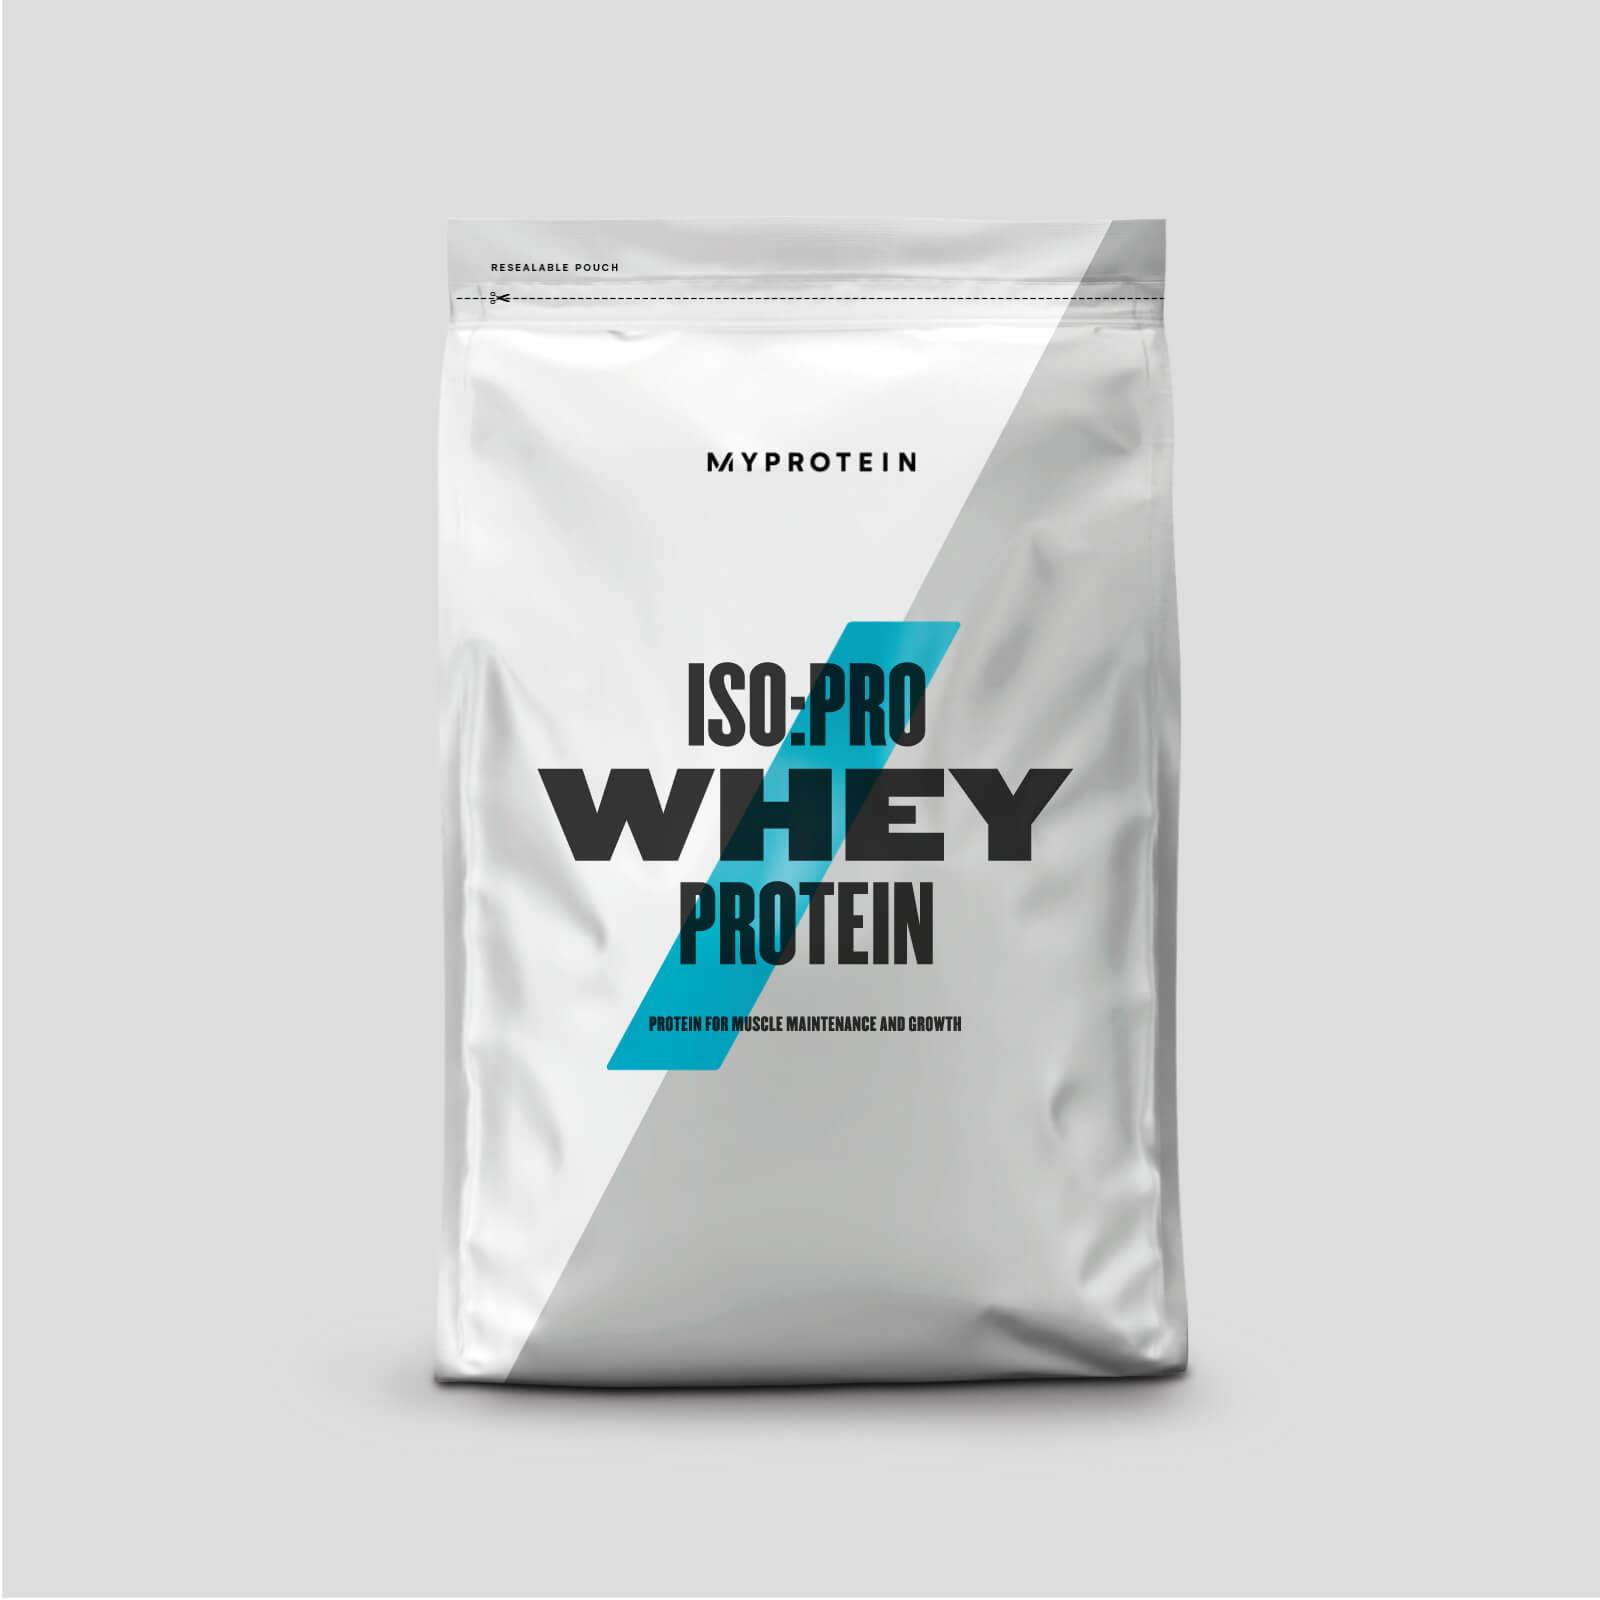 Myprotein ISO: PRO Whey en poudre - 1kg - Fraise